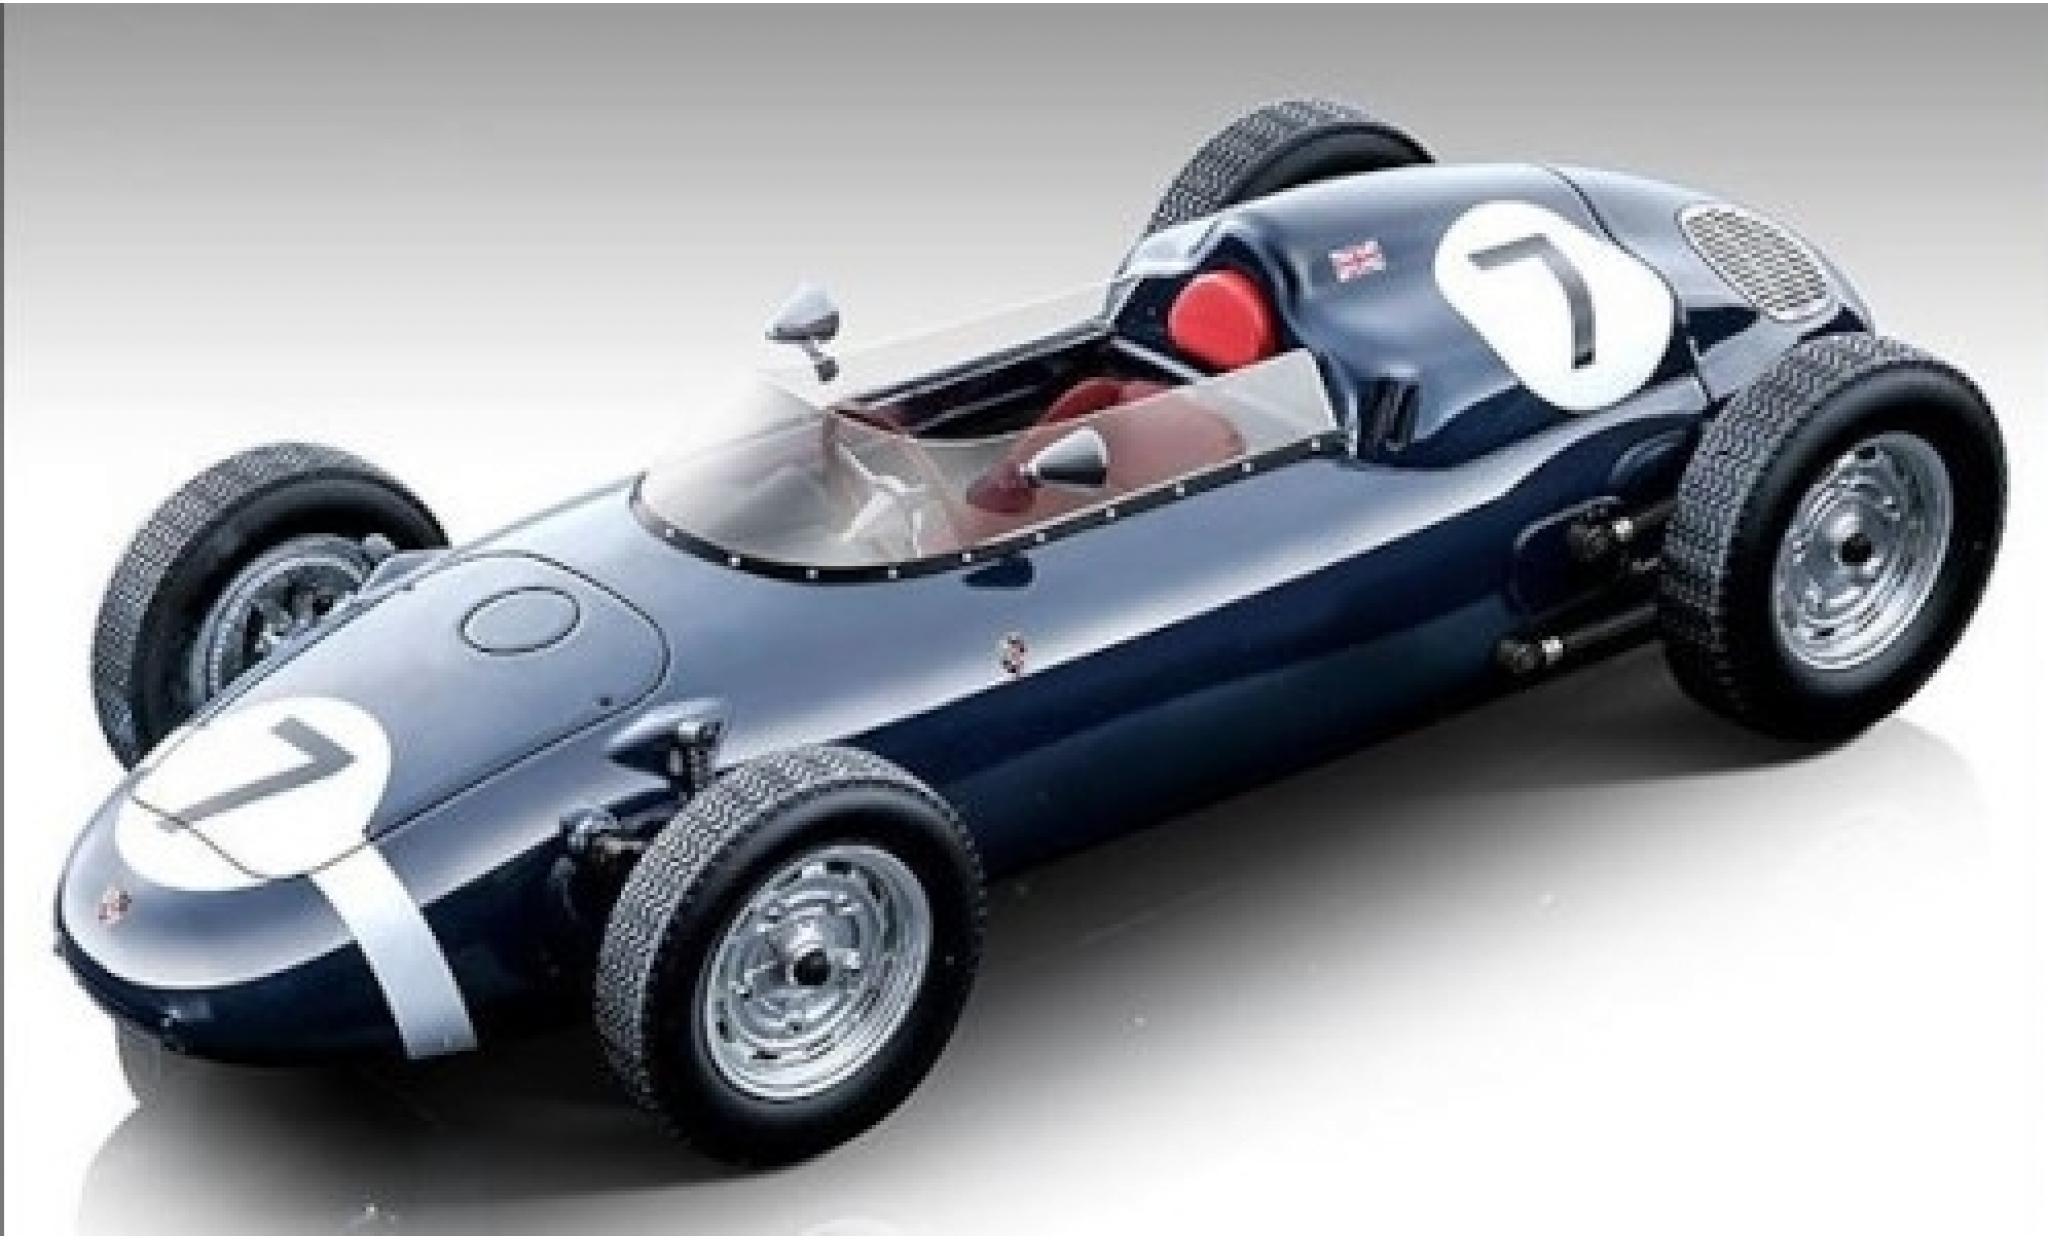 Porsche 718 1/18 Tecnomodel F2 No.7 Team Rob Walker BARC Aintree 1960 S.Moss